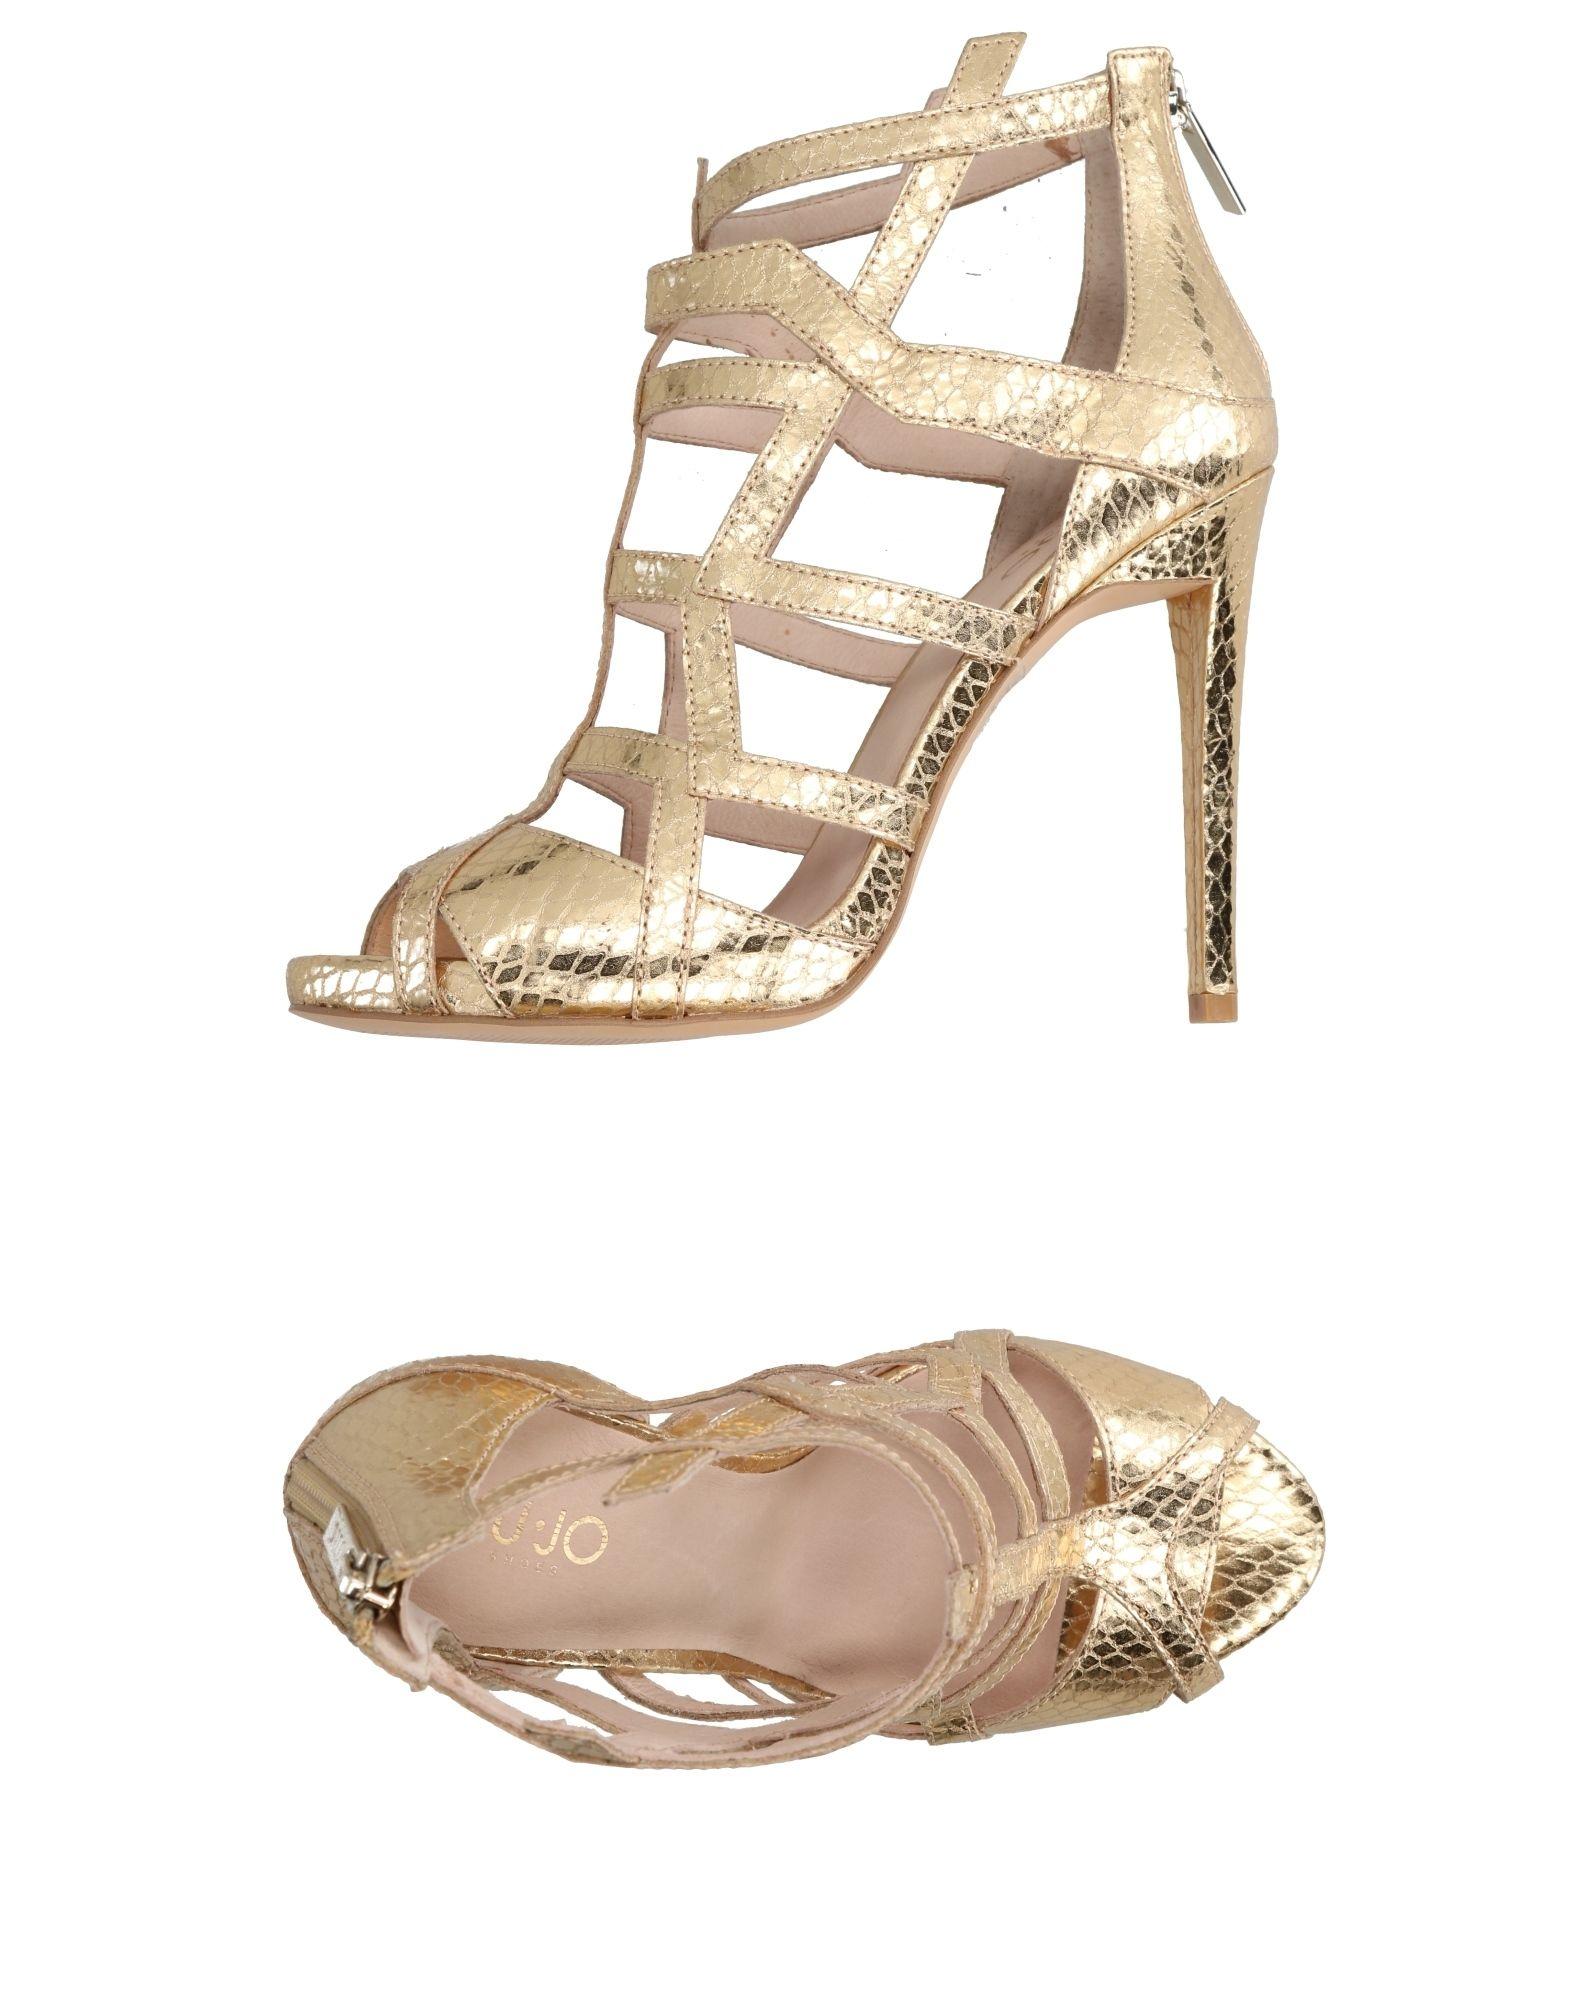 Stilvolle billige Schuhe Damen Liu •Jo Schuhes Sandalen Damen Schuhe 11296950RN c4d992